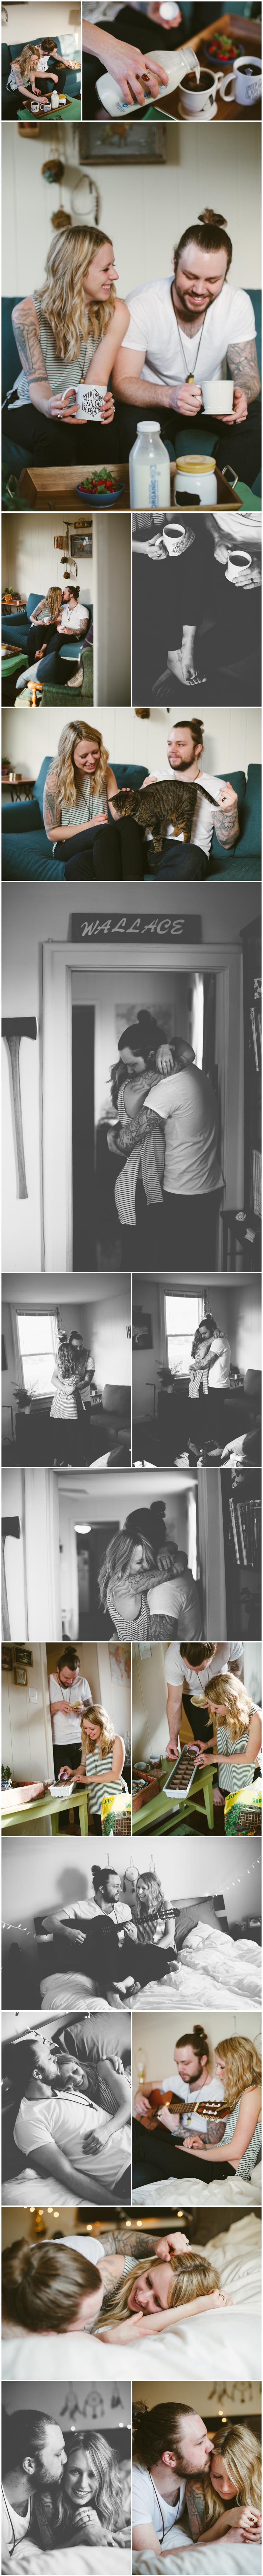 Blog Collage-Ashley+Aaron3